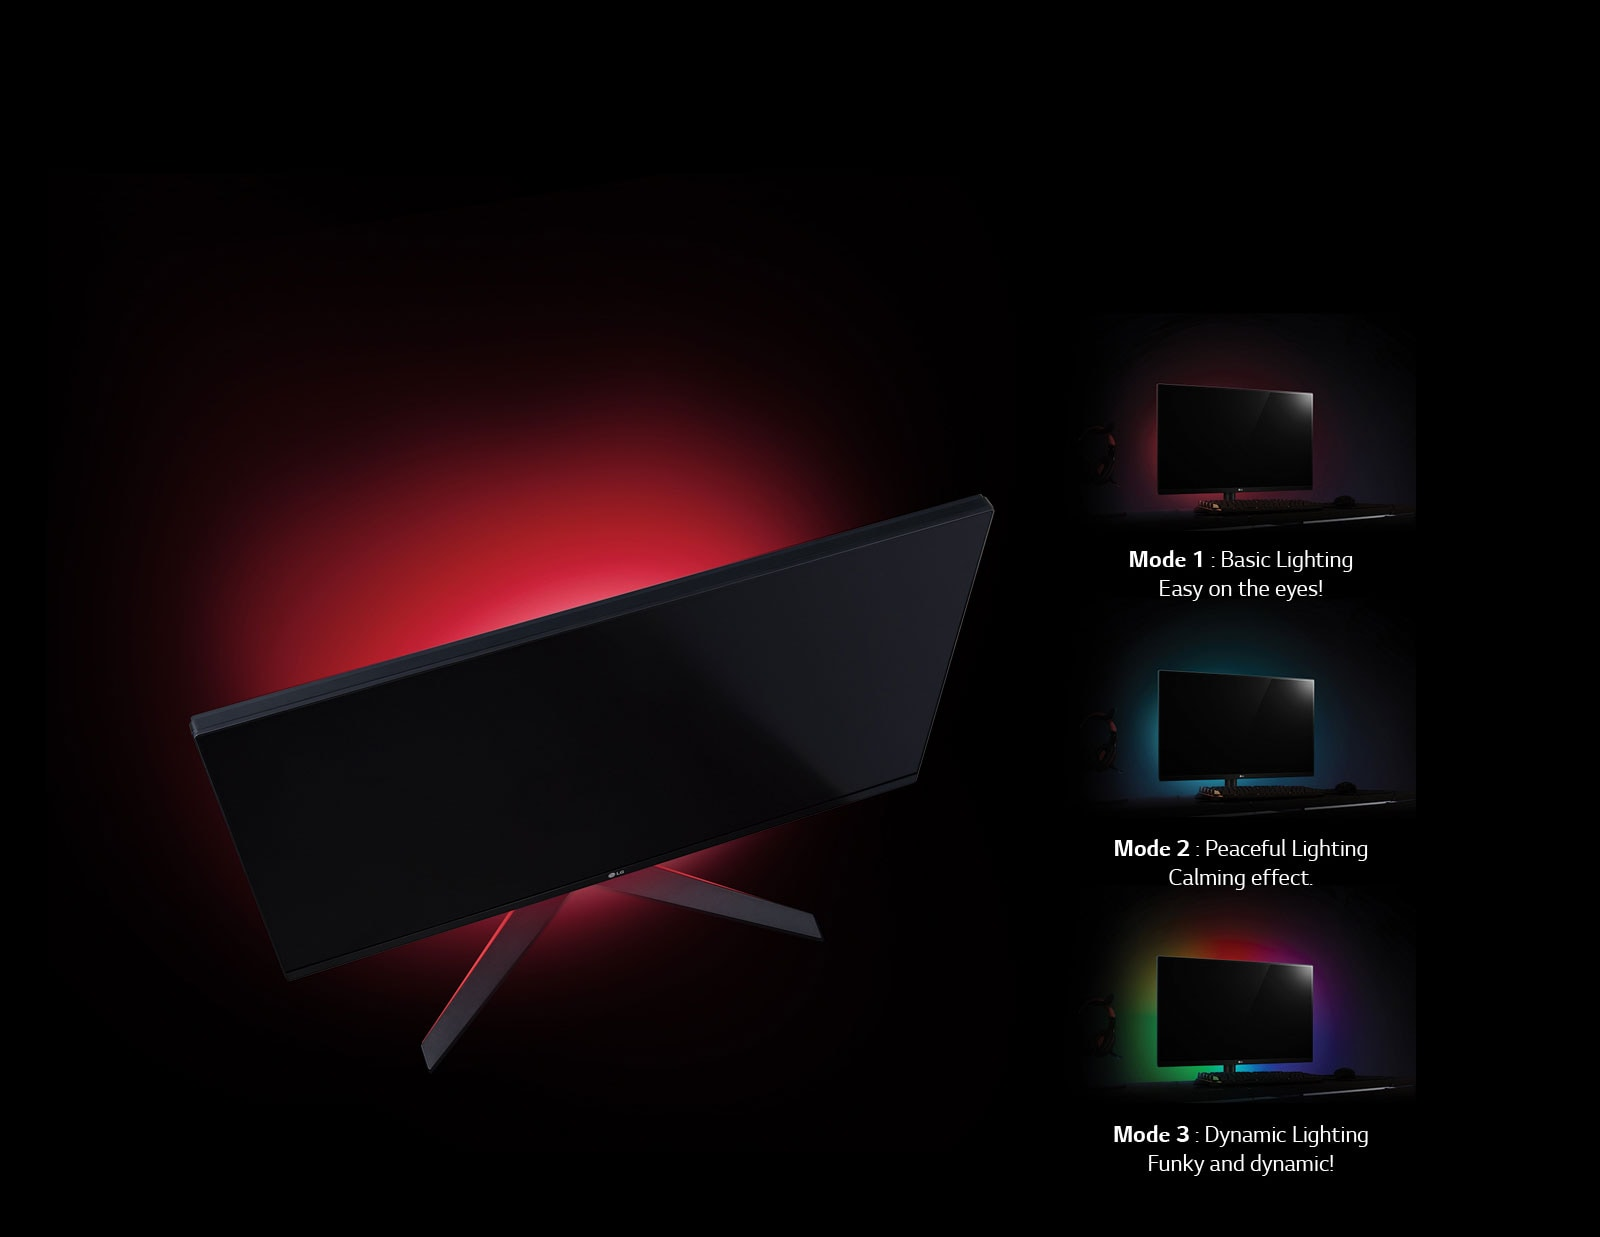 LG 31 5 144Hz QHD Gaming Monitor with Nvidia G-Sync | LG